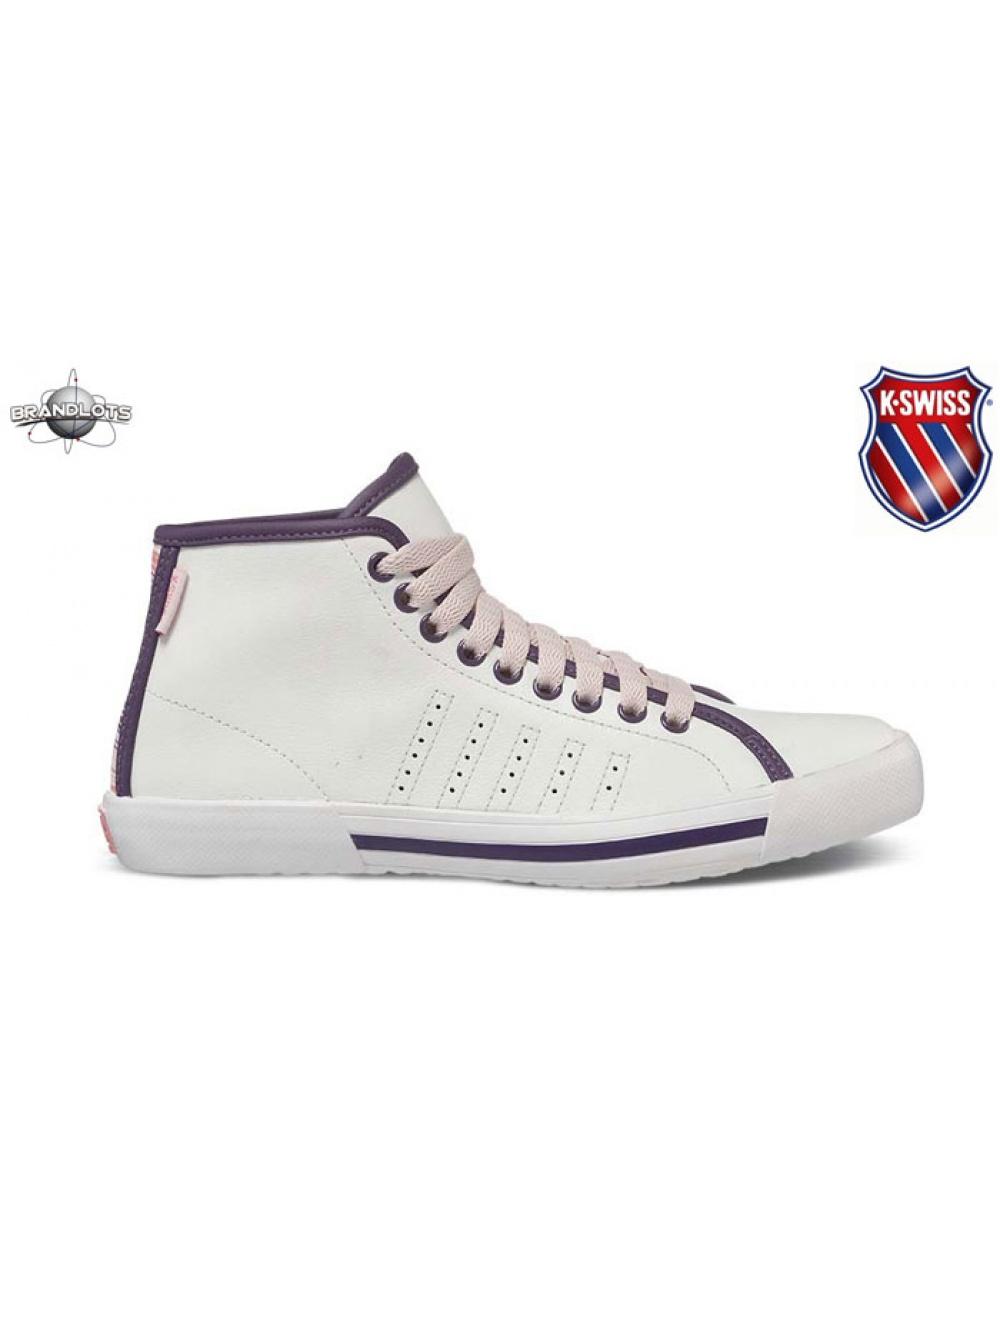 Sneaker Schuh Skimmer